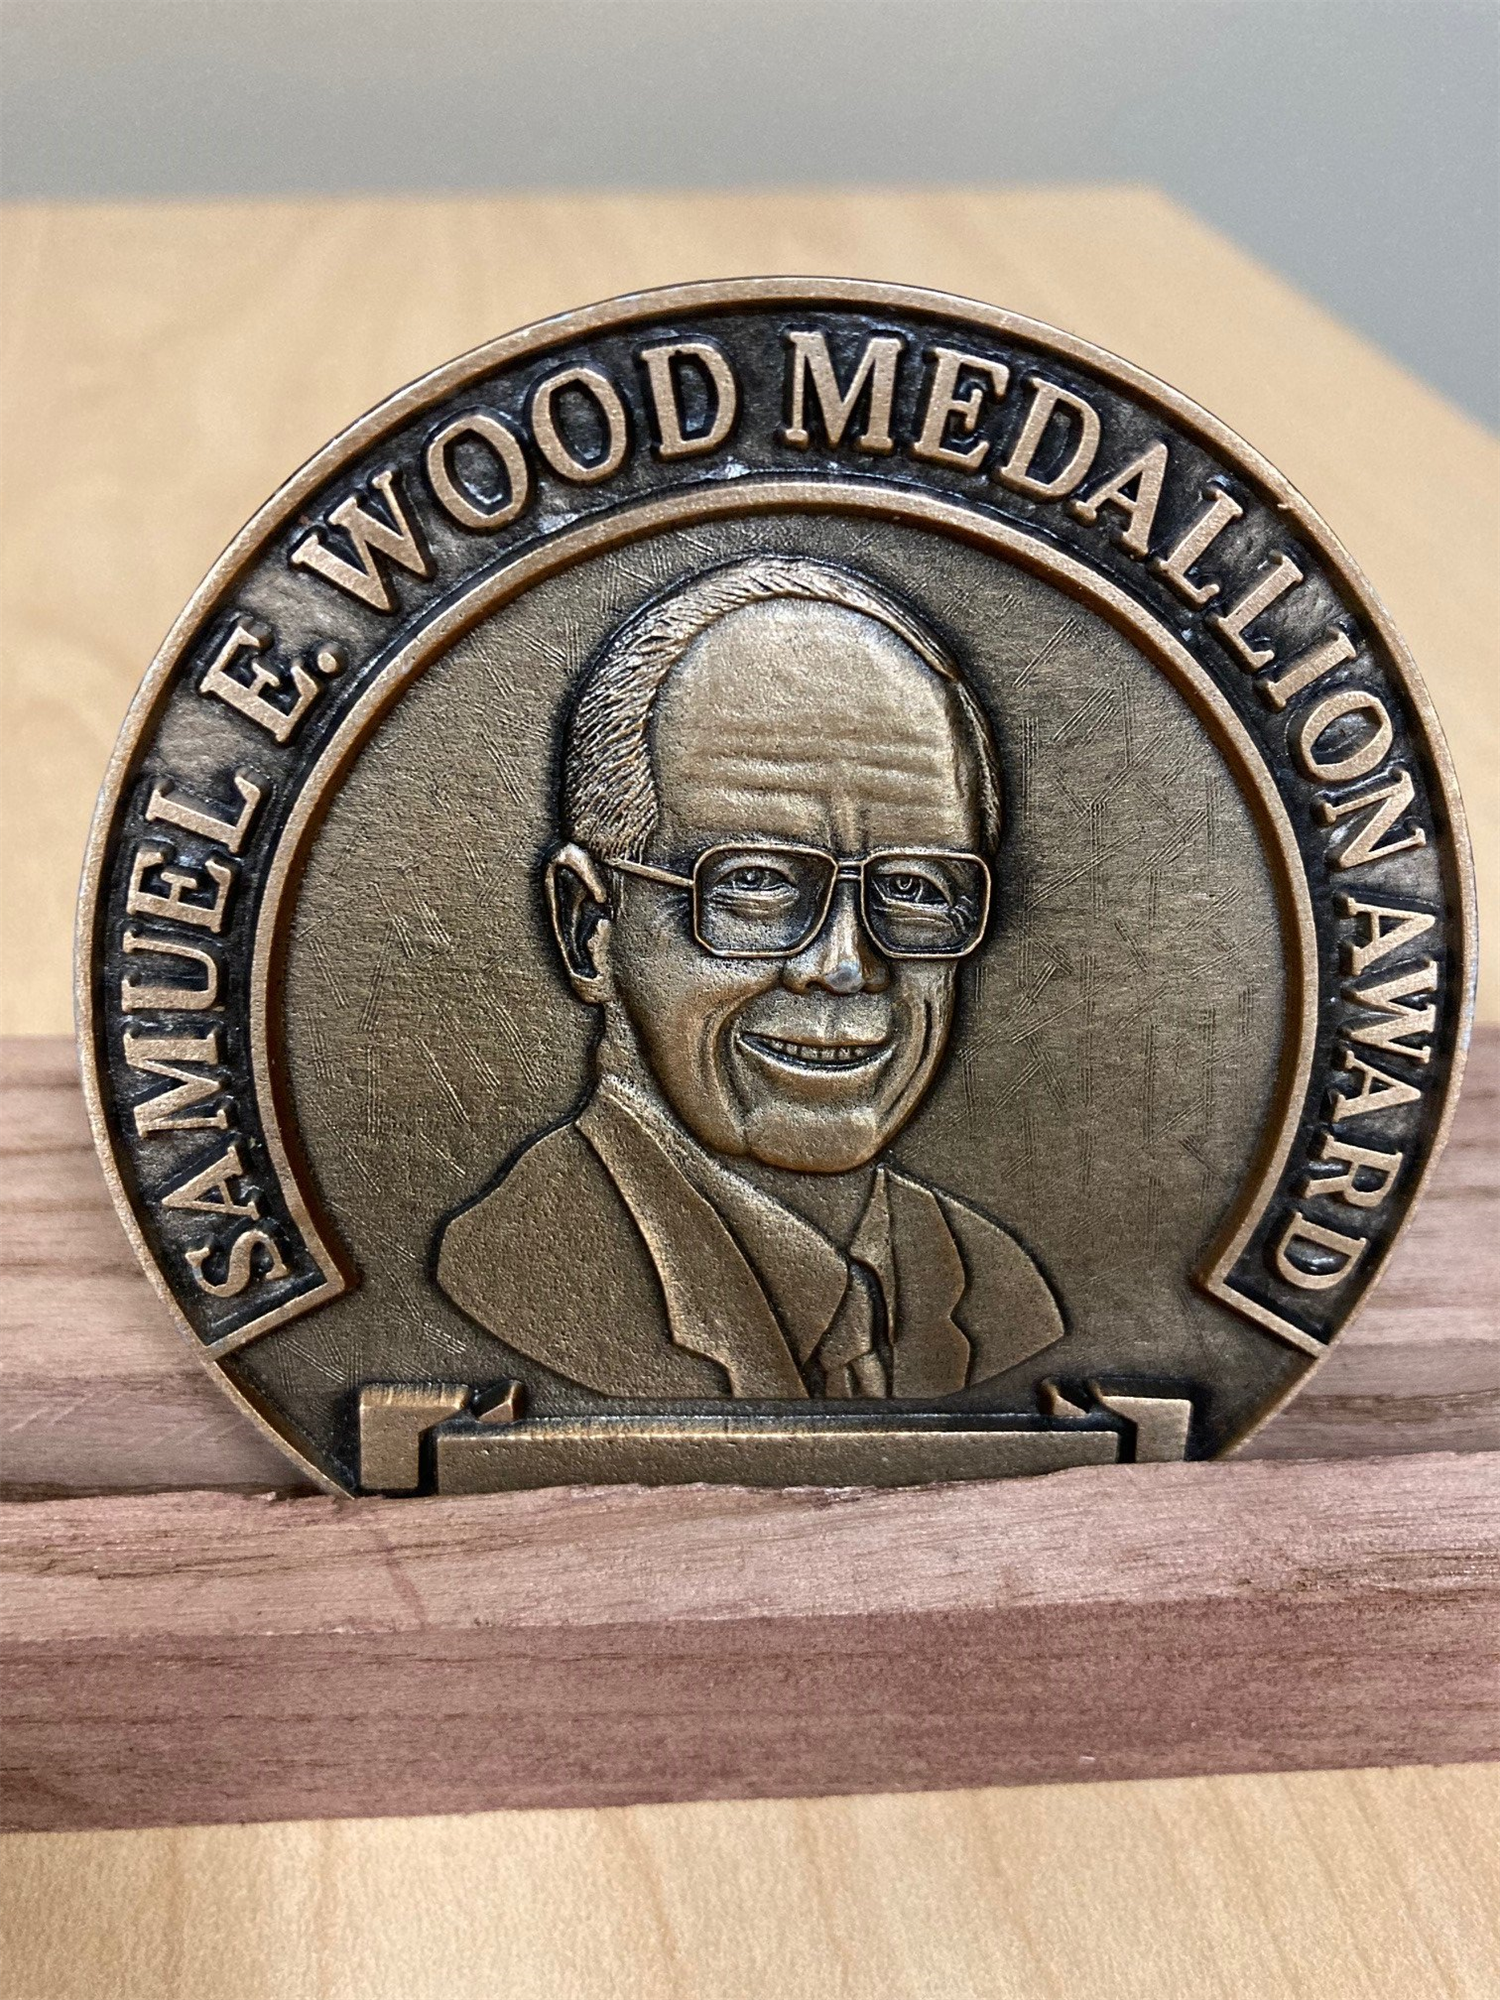 Photo of the Samuel E. Wood Medallion Award